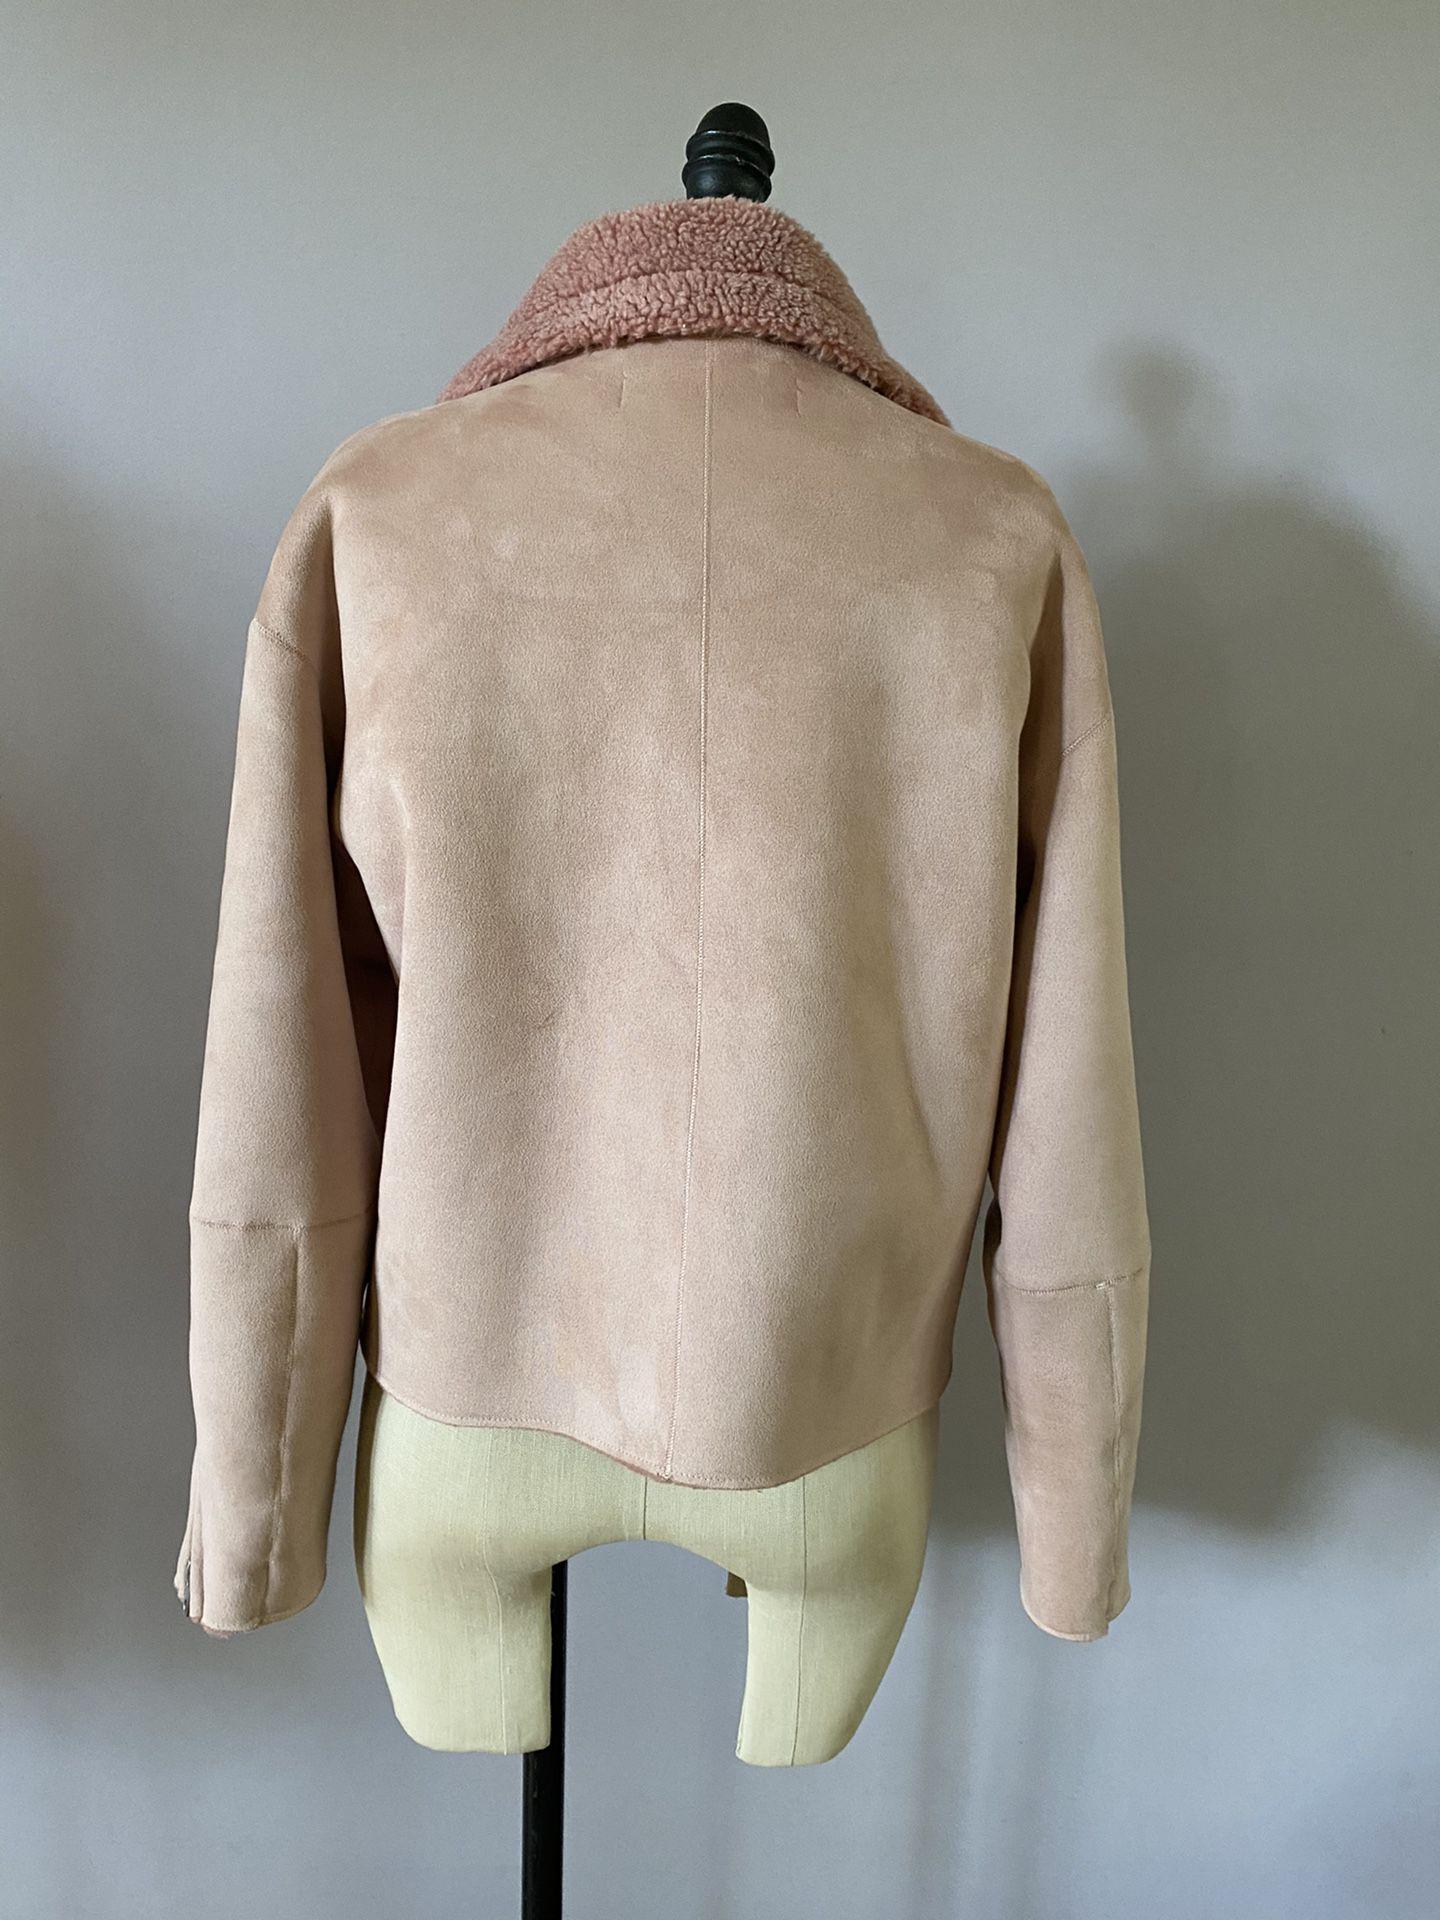 Zara faux shearling jacket size Medium. Dusty pink color